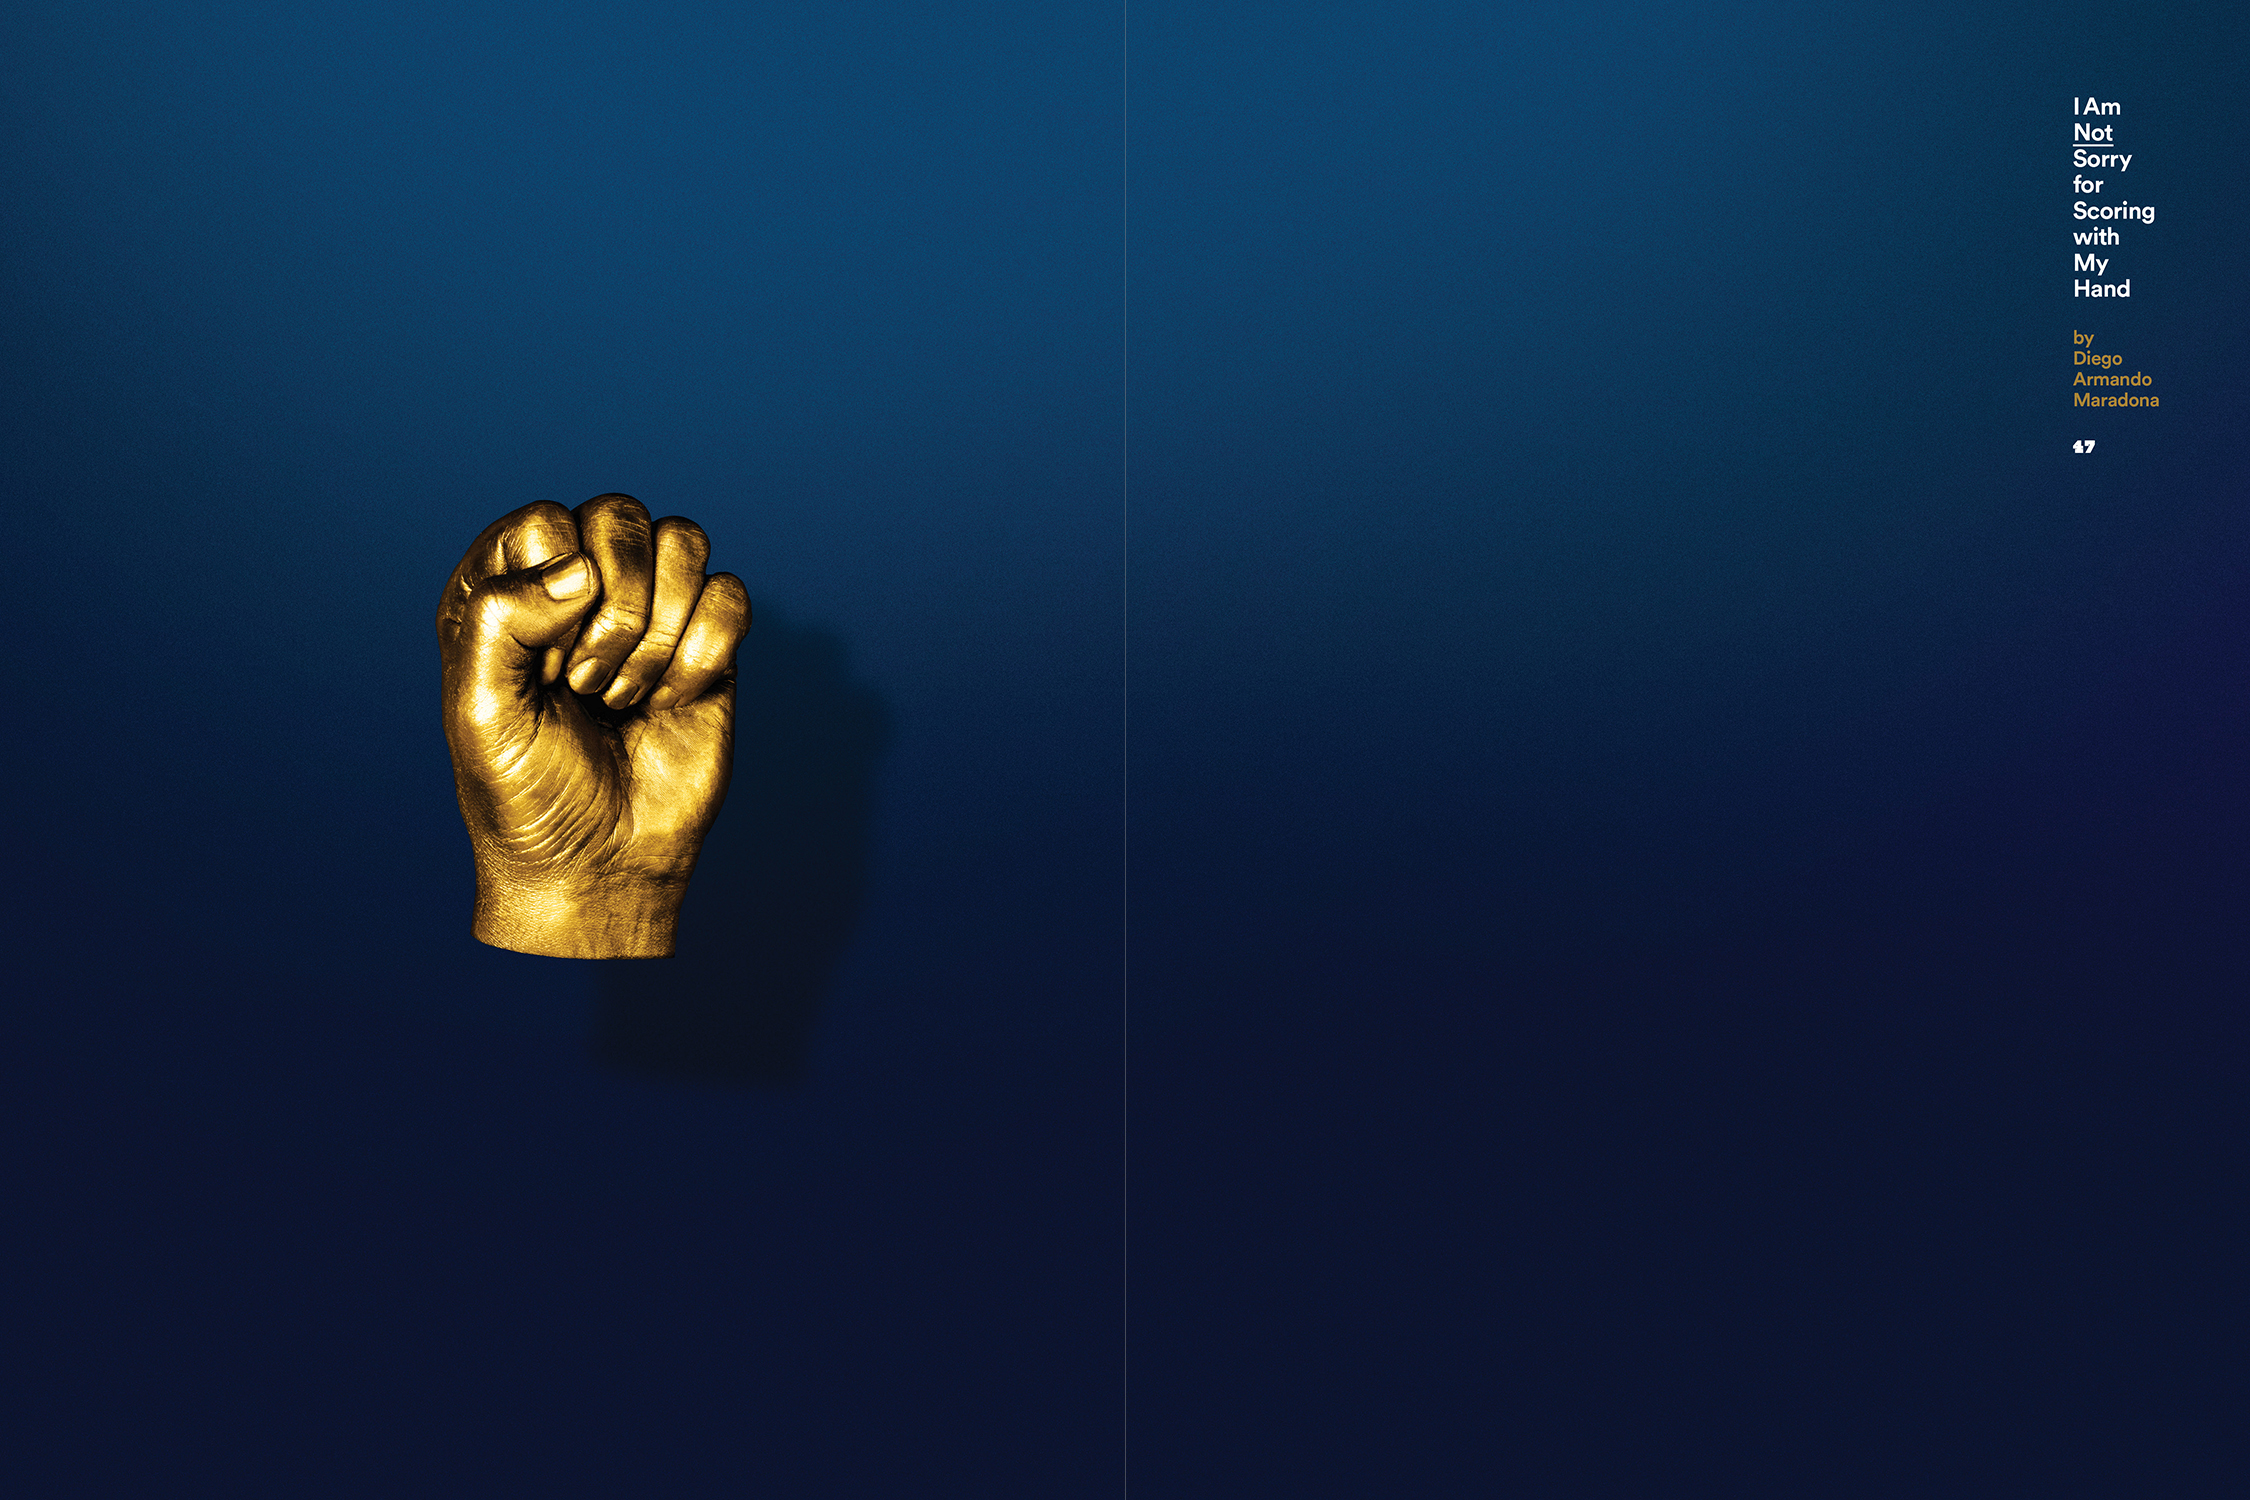 tforrester_HOWL_Maradona_FINAL